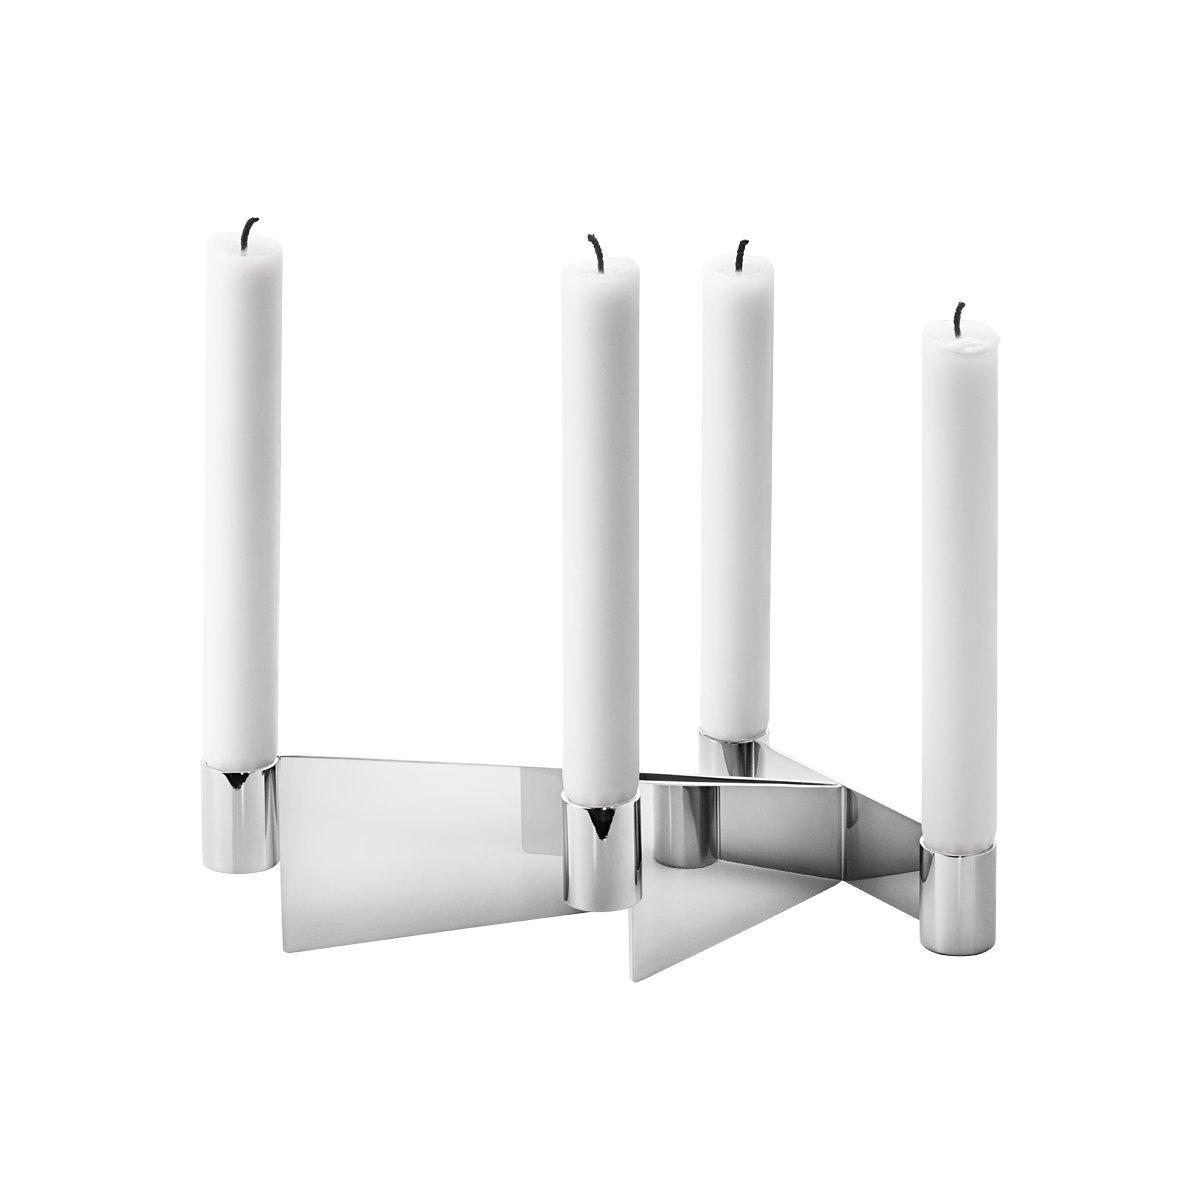 Georg Jensen URKIOLA candleholder stainless steel 3586015